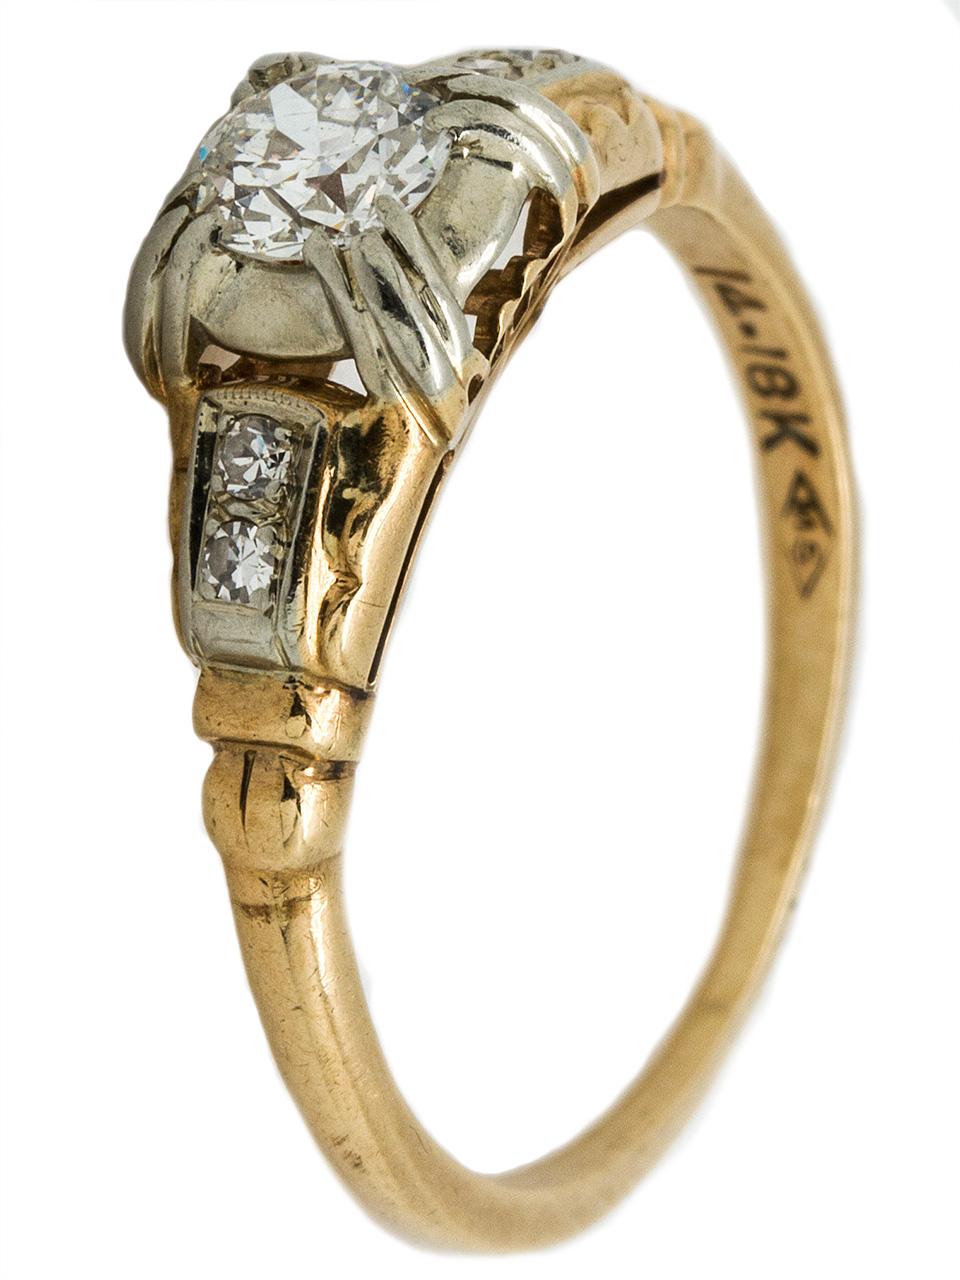 14K Retro Diamond Engagement Ring, circa 1940s